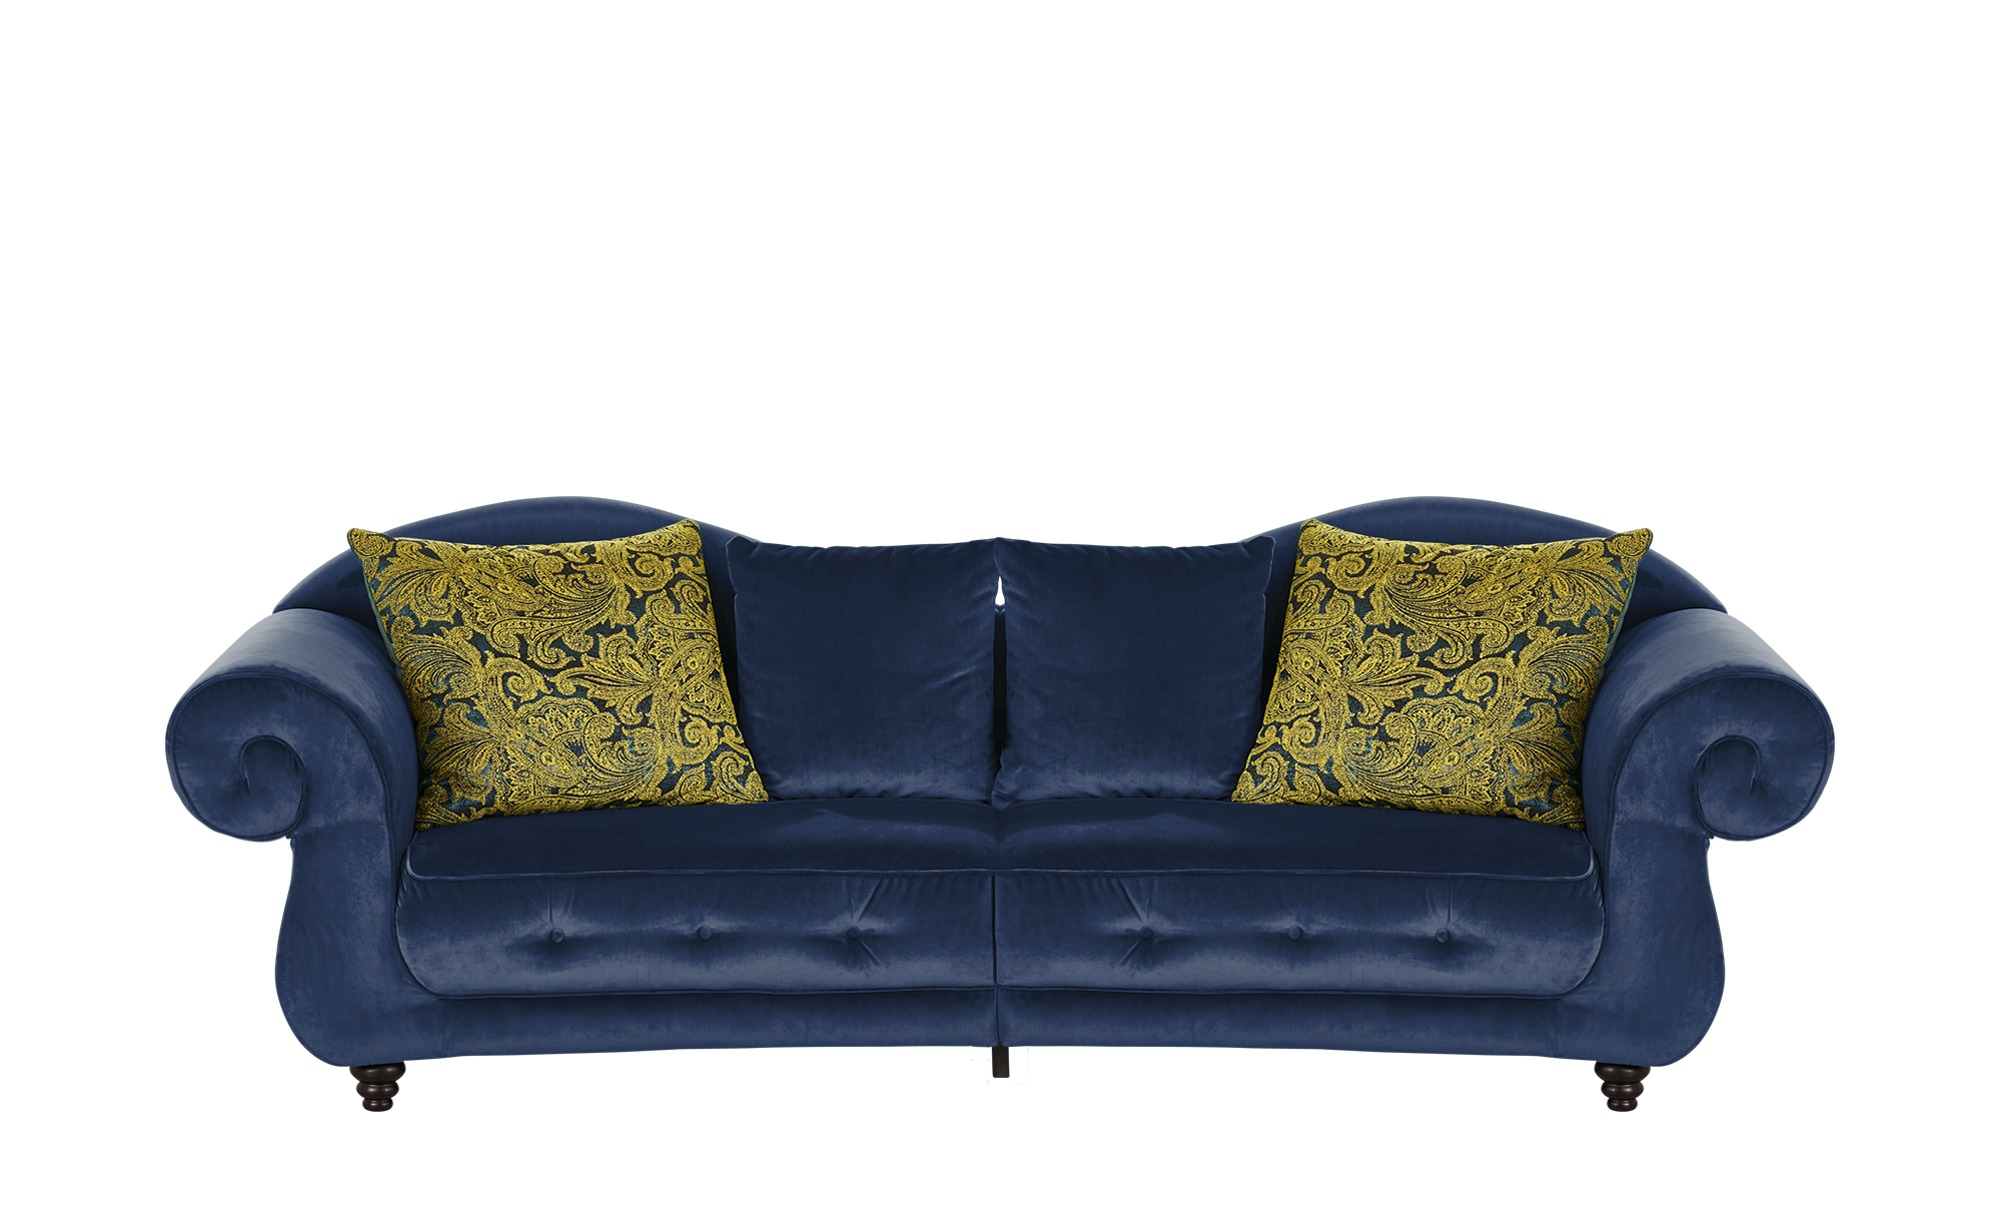 Design Big Sofa blau - Mikrofaser Nobody ¦ blau ¦ Maße (cm): B: 288 H: 98 T: 110 Polstermöbel > Sofas > Big-Sofas - Höffner